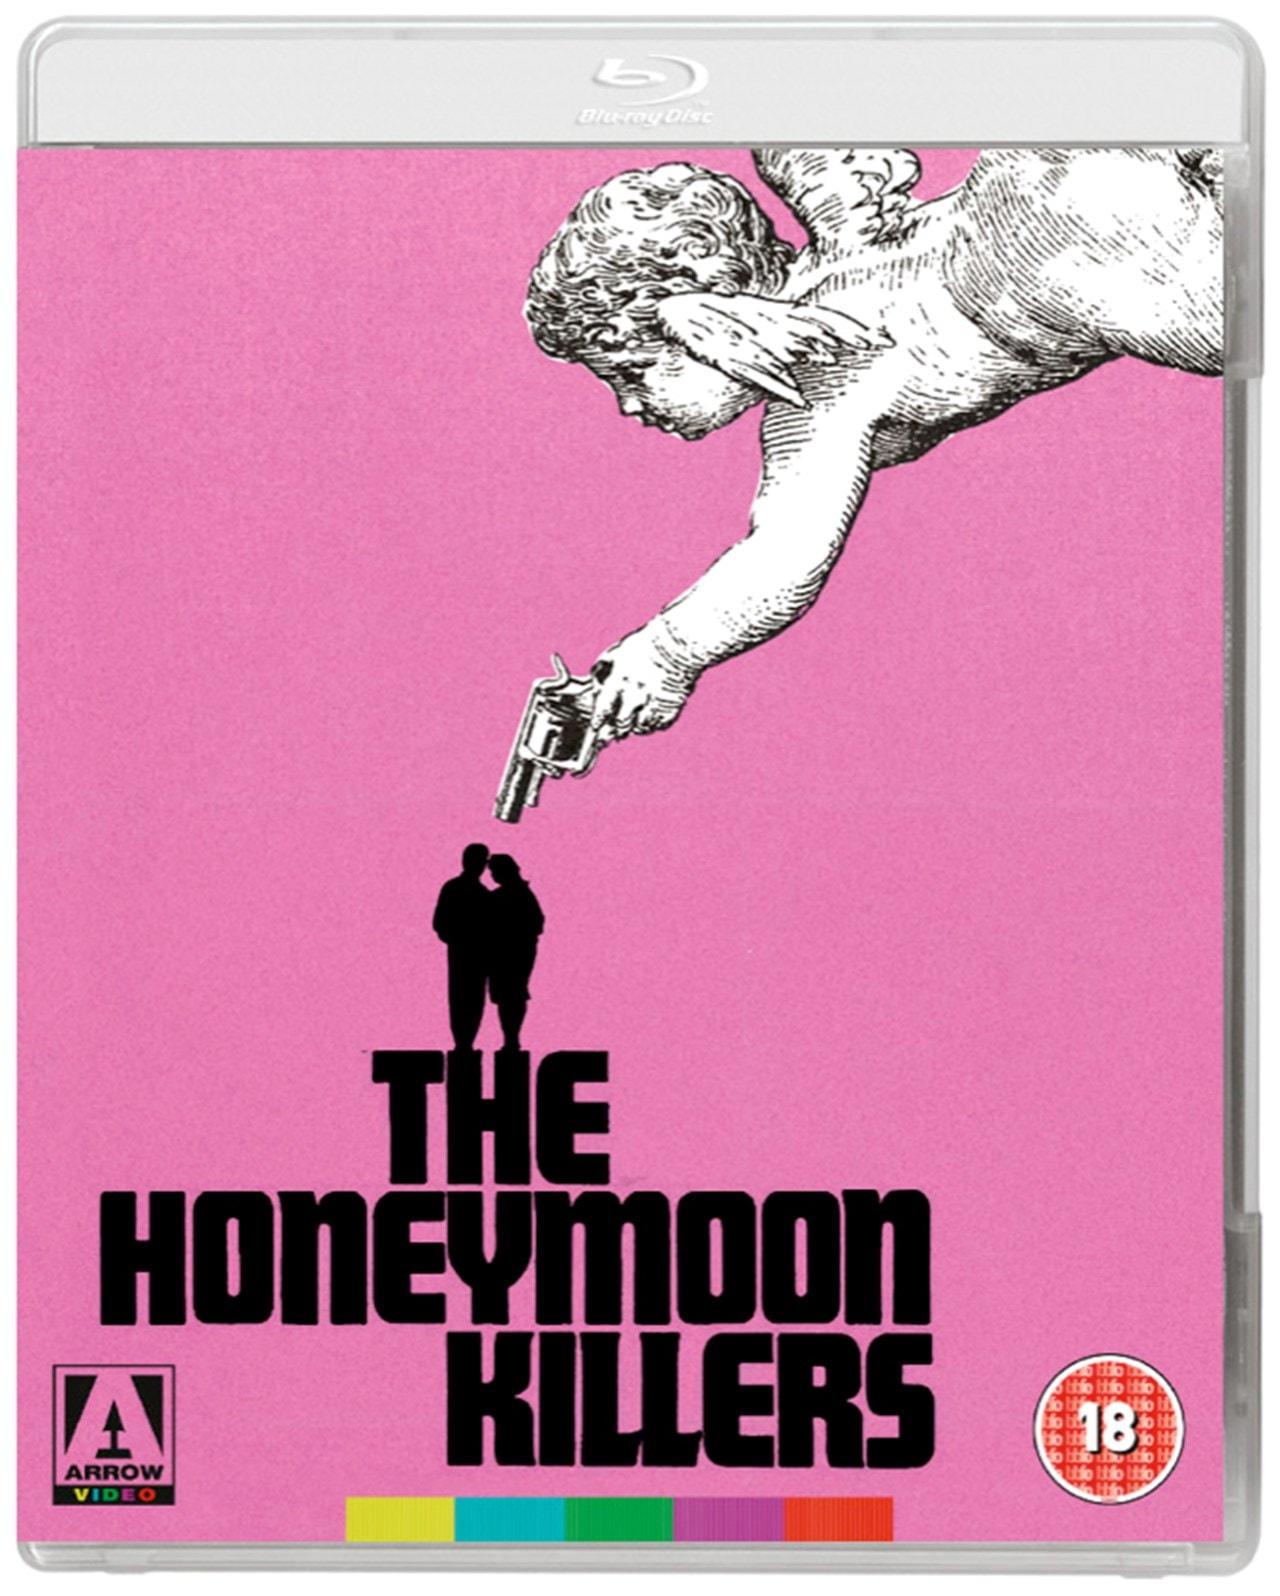 The Honeymoon Killers - 1